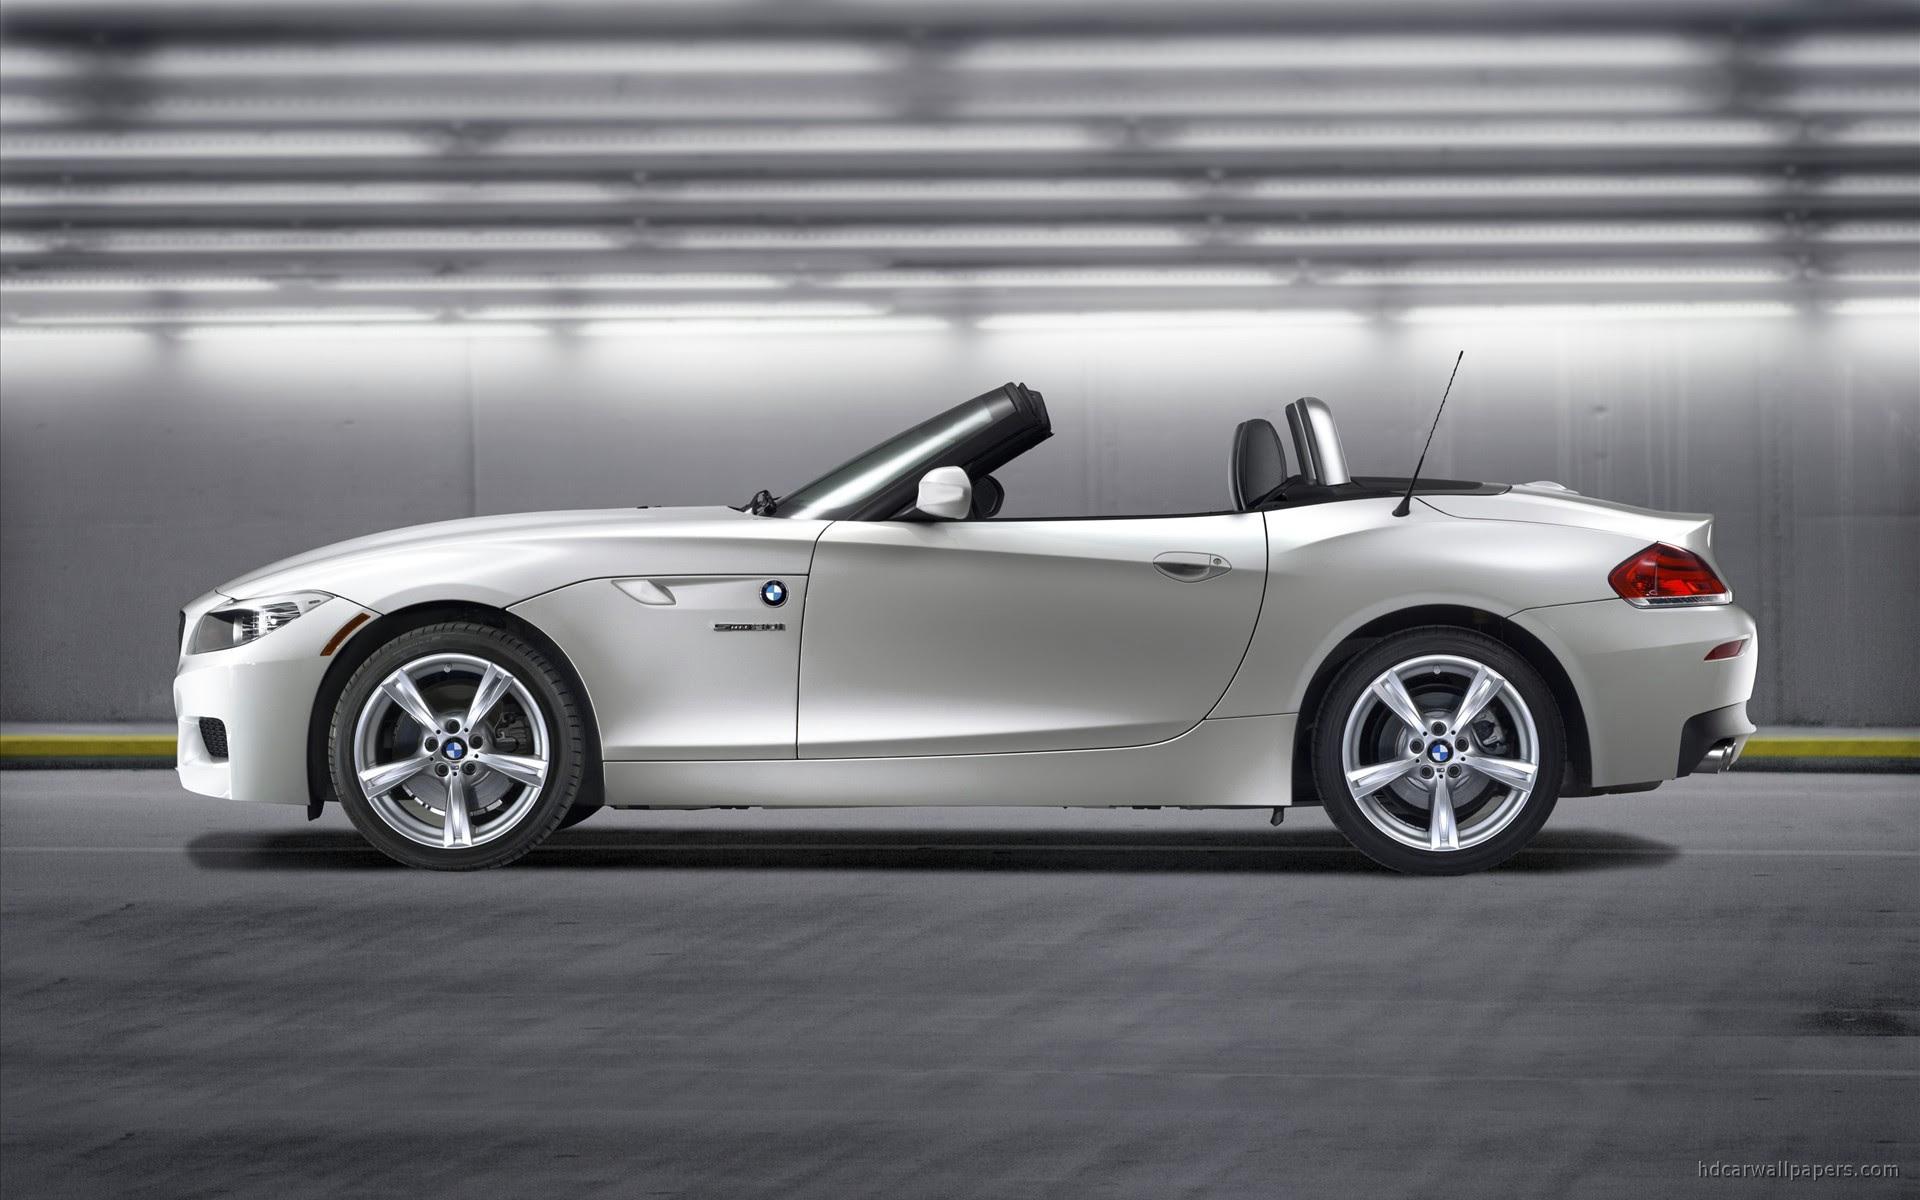 2011 BMW Z4 Wallpaper   HD Car Wallpapers   ID #322